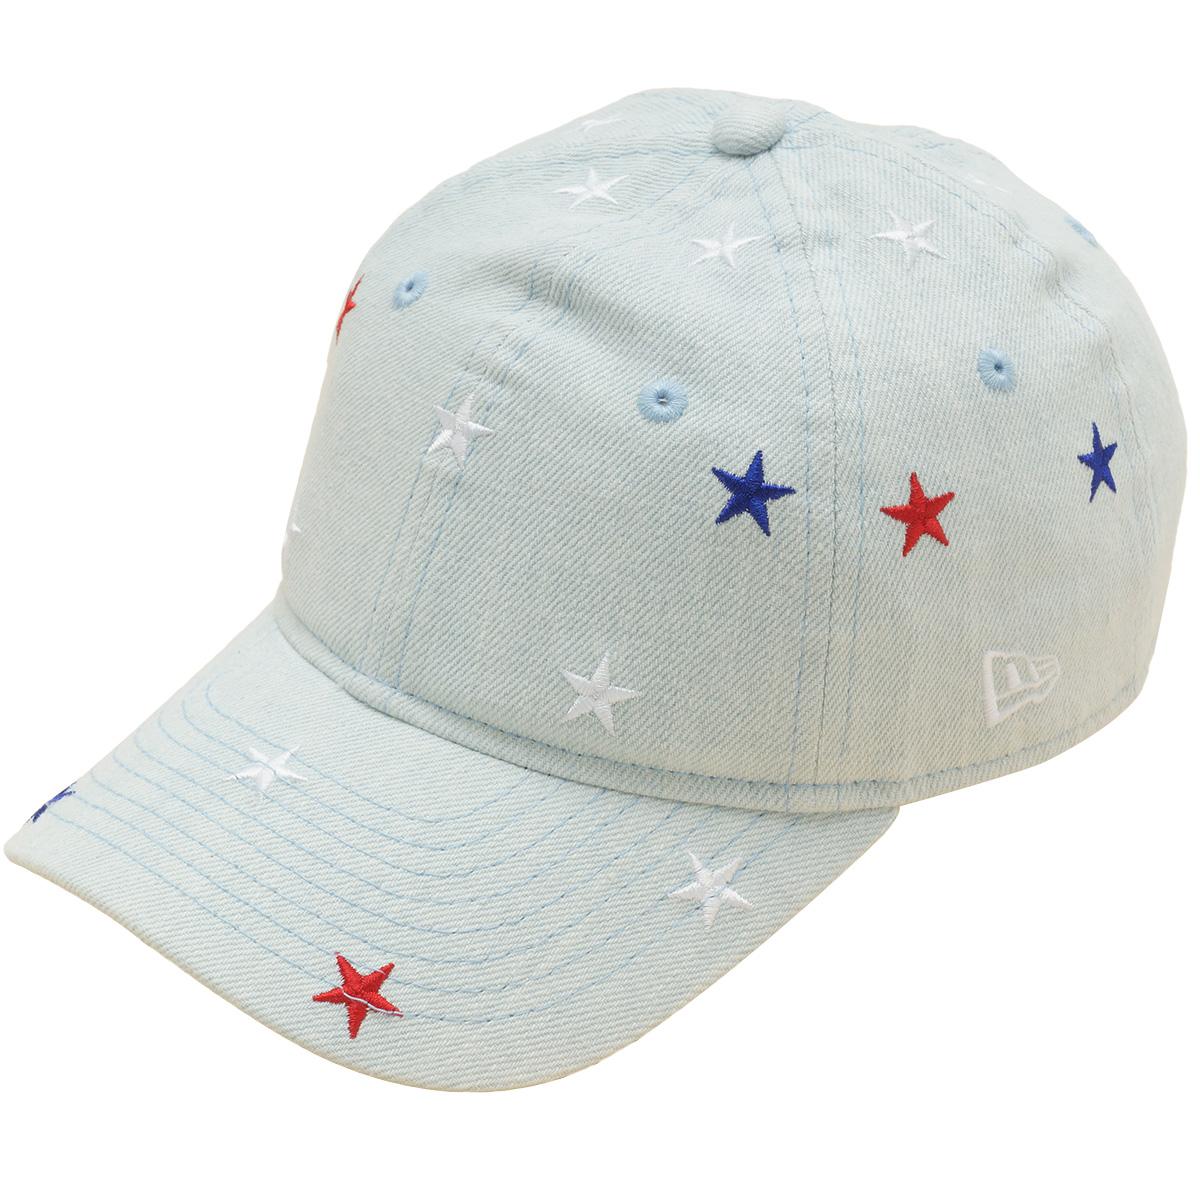 YOUTH 920 STARS EMB キャップジュニア